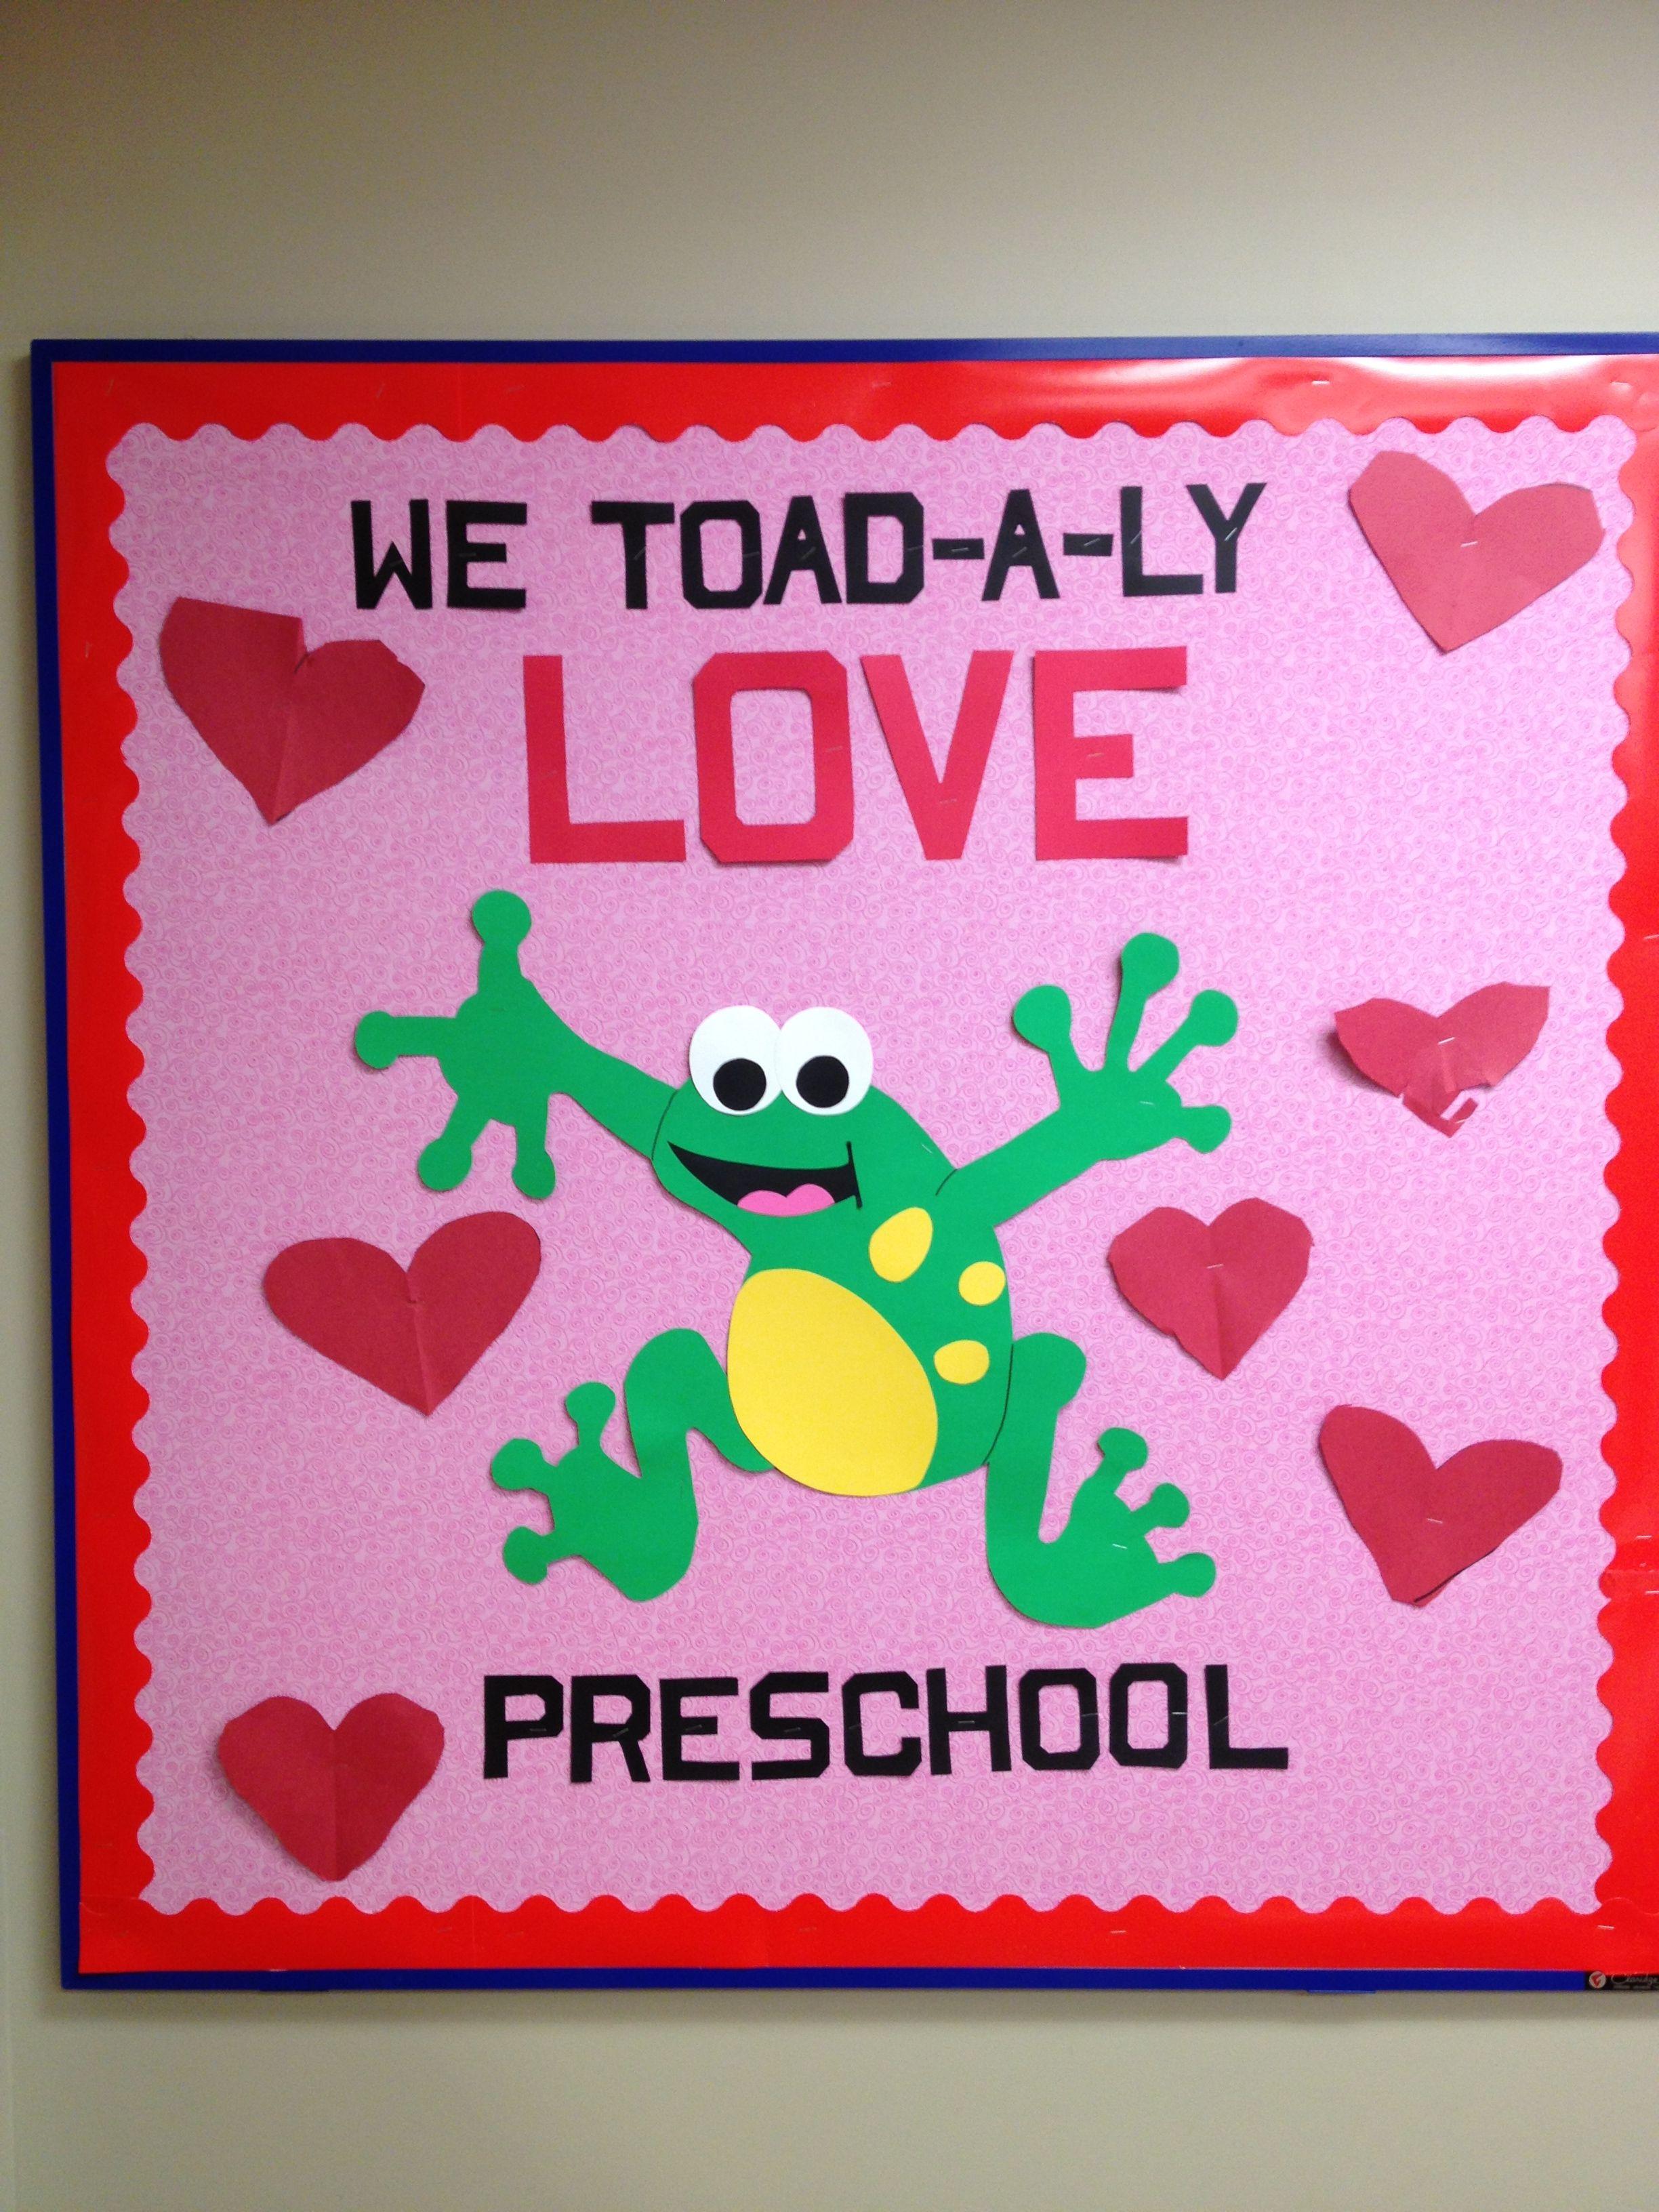 3a7888a333d87abde8442f3b9f9ef802 - Bulletin Board Ideas For Kindergarten